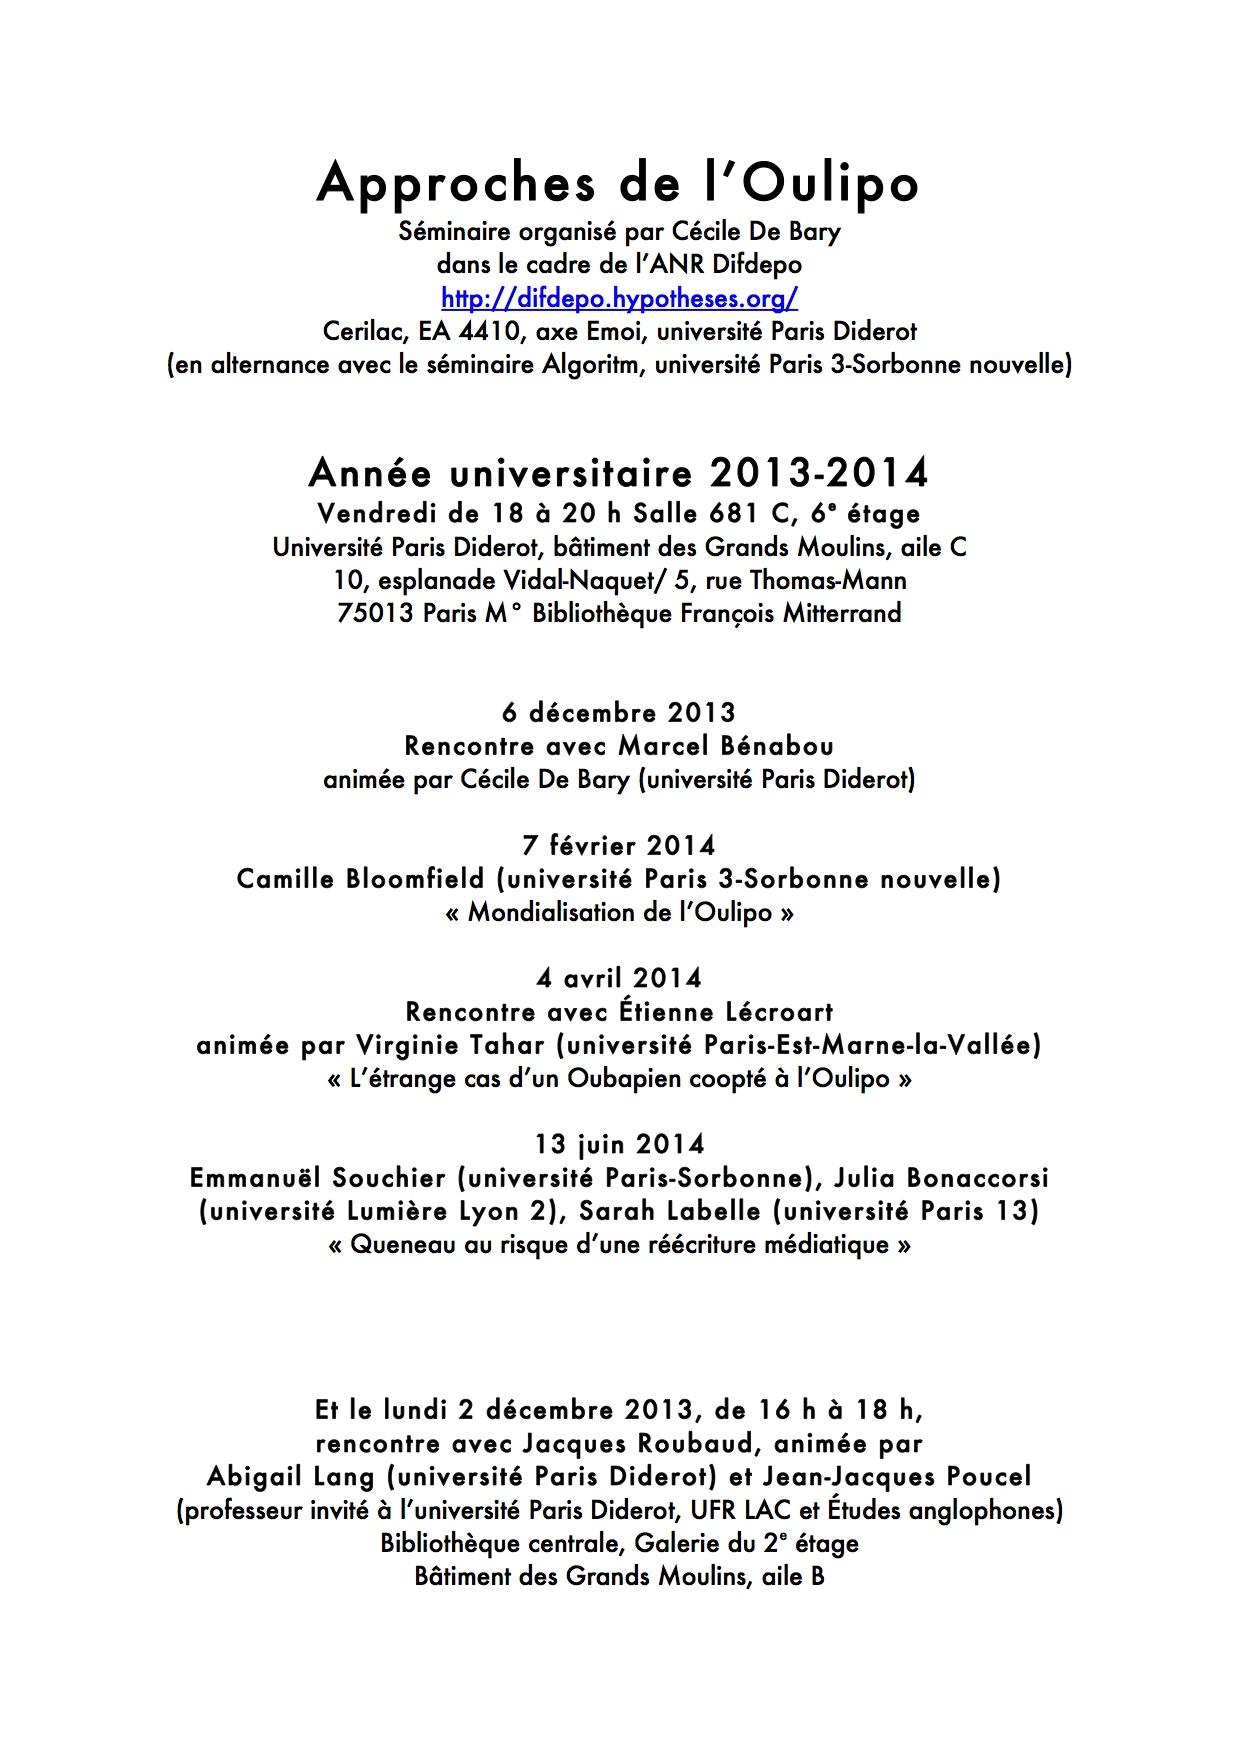 SéminaireOulipo2013-14